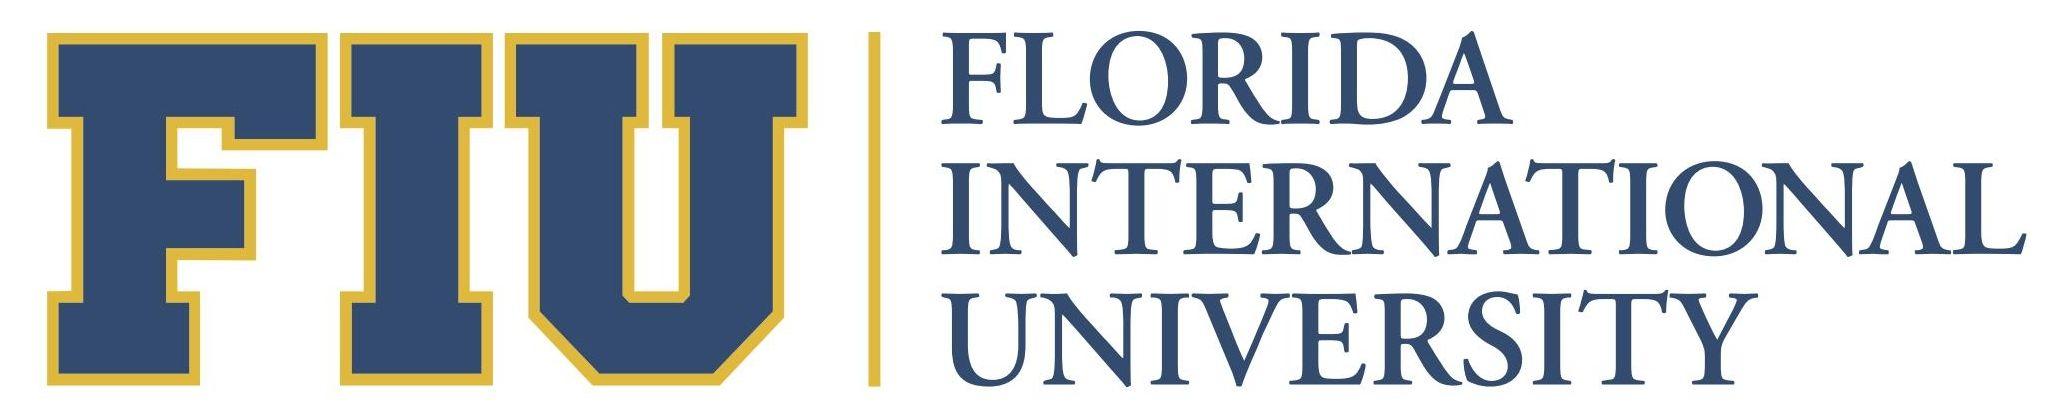 Fiu Logo Florida International University Florida International University University Logo University